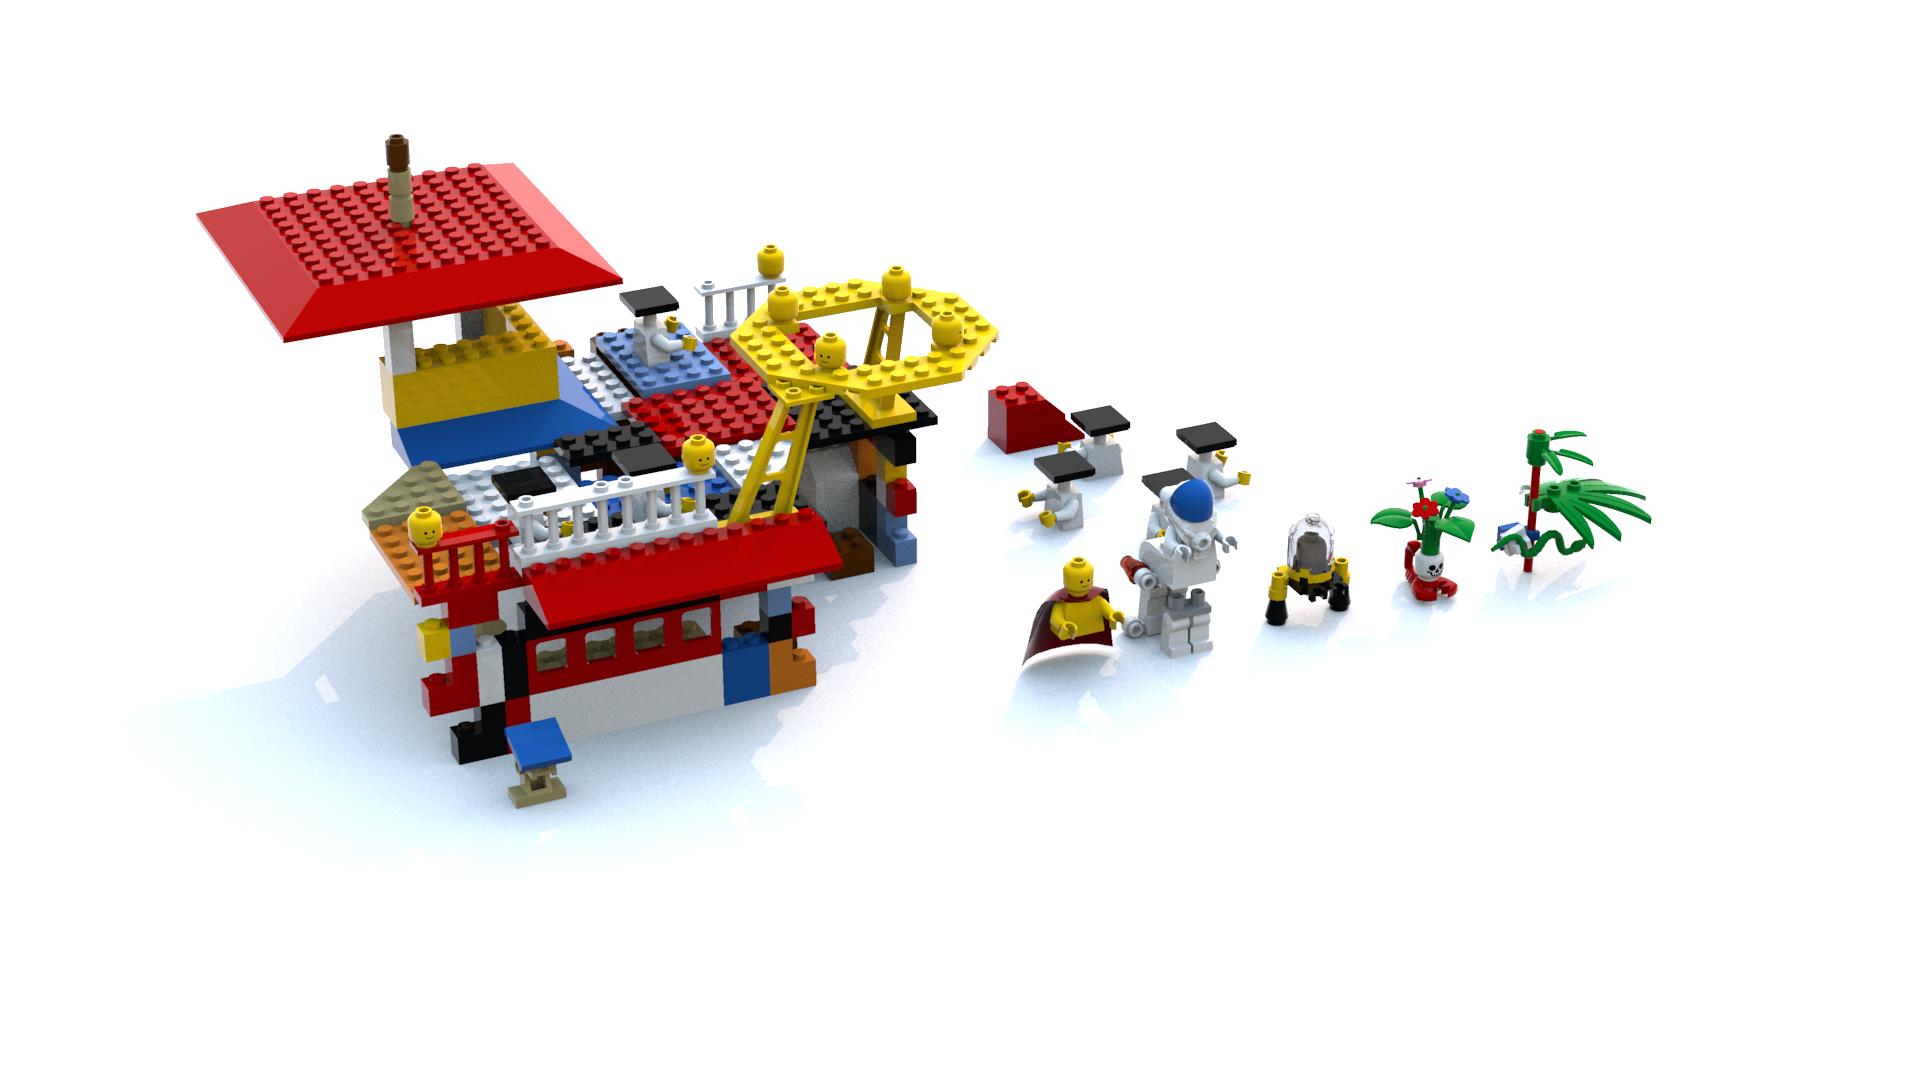 Lego Island 2 Ogel Island Pizzeria LDD Model - Personal